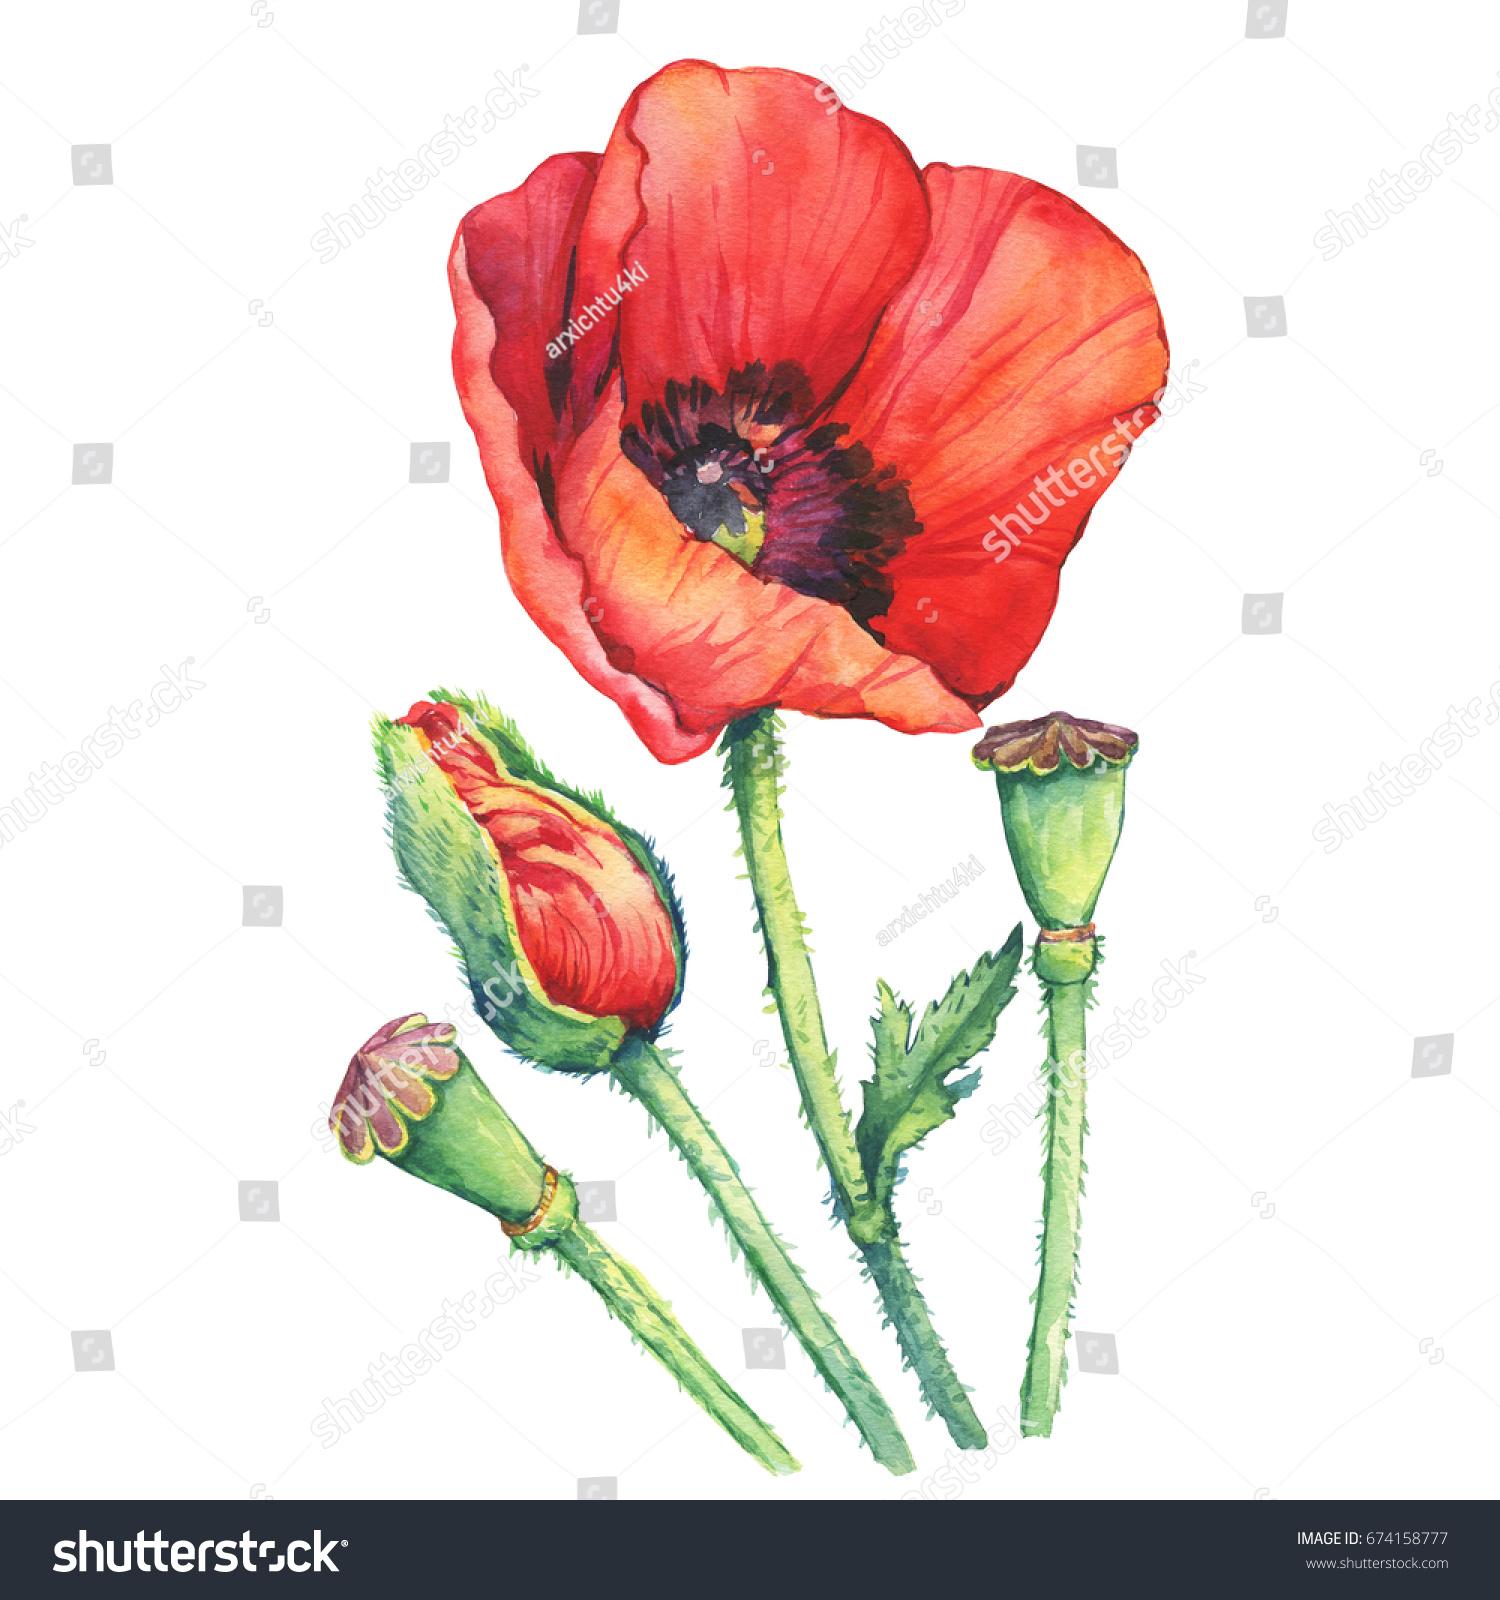 Red poppies flowers bud papaver somniferum stock illustration red poppies flowers with a bud papaver somniferum the opium poppy watercolor mightylinksfo